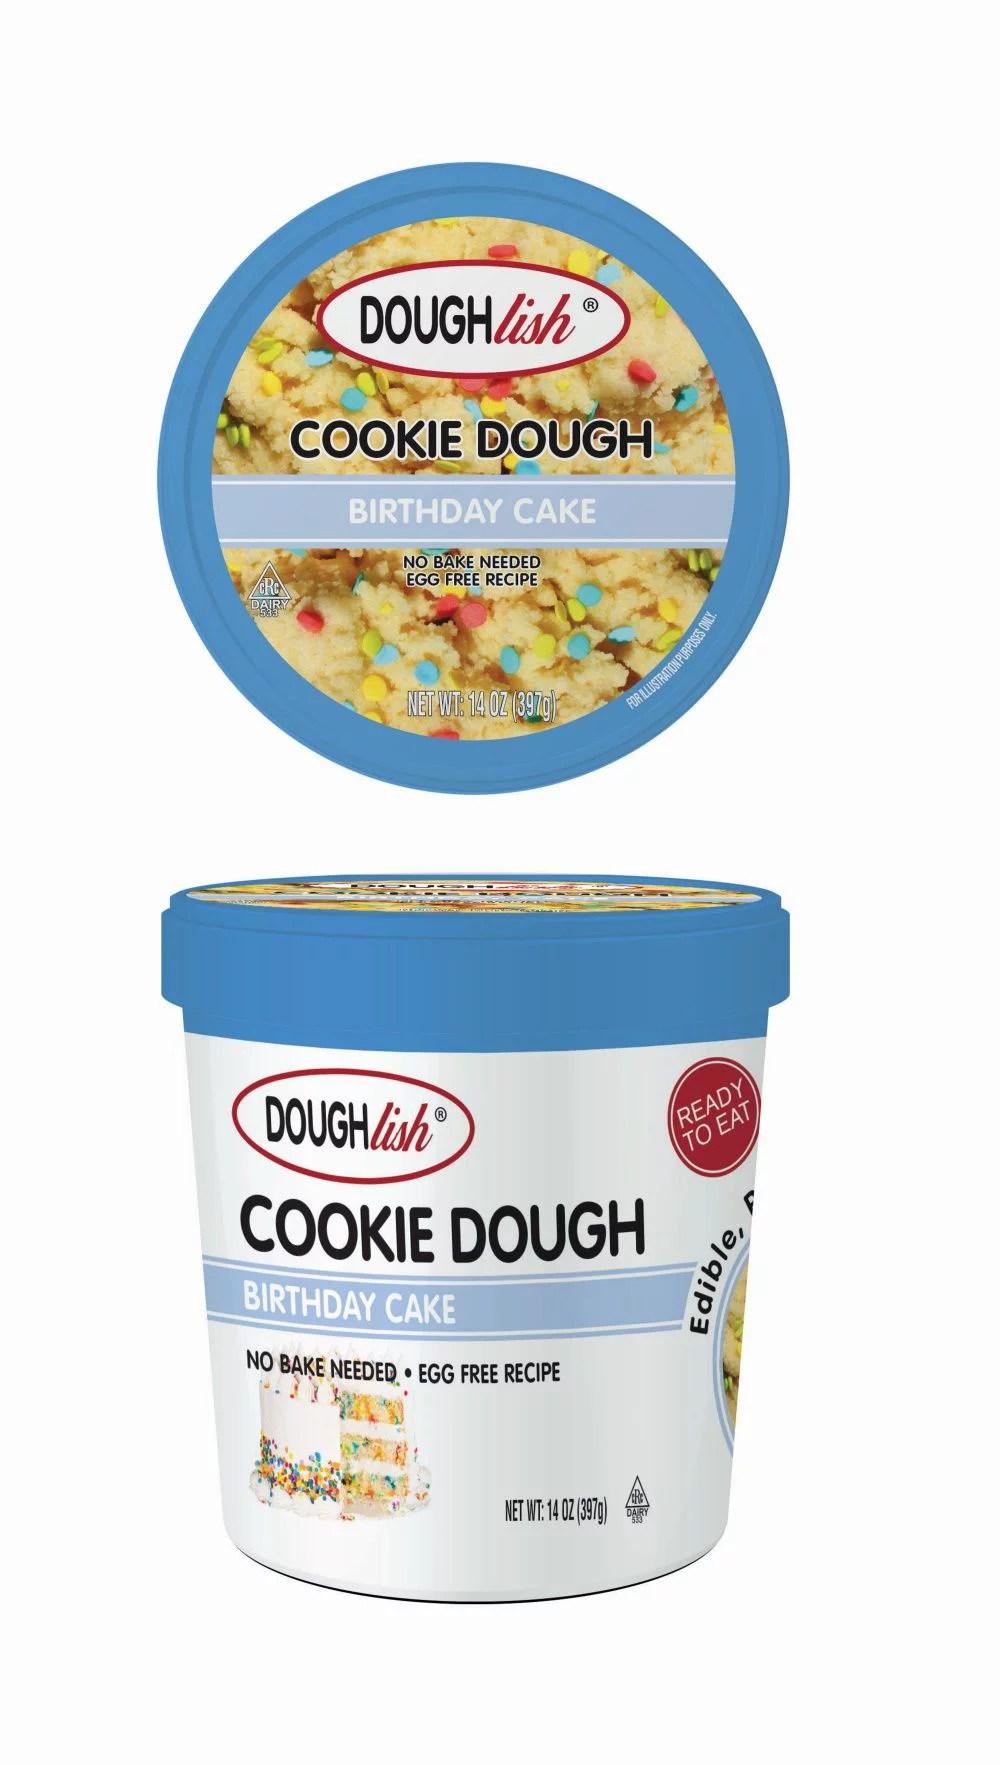 Doughlish Edible Cookie Dough Birthday Cake Pint 14 Oz Walmart Com Walmart Com